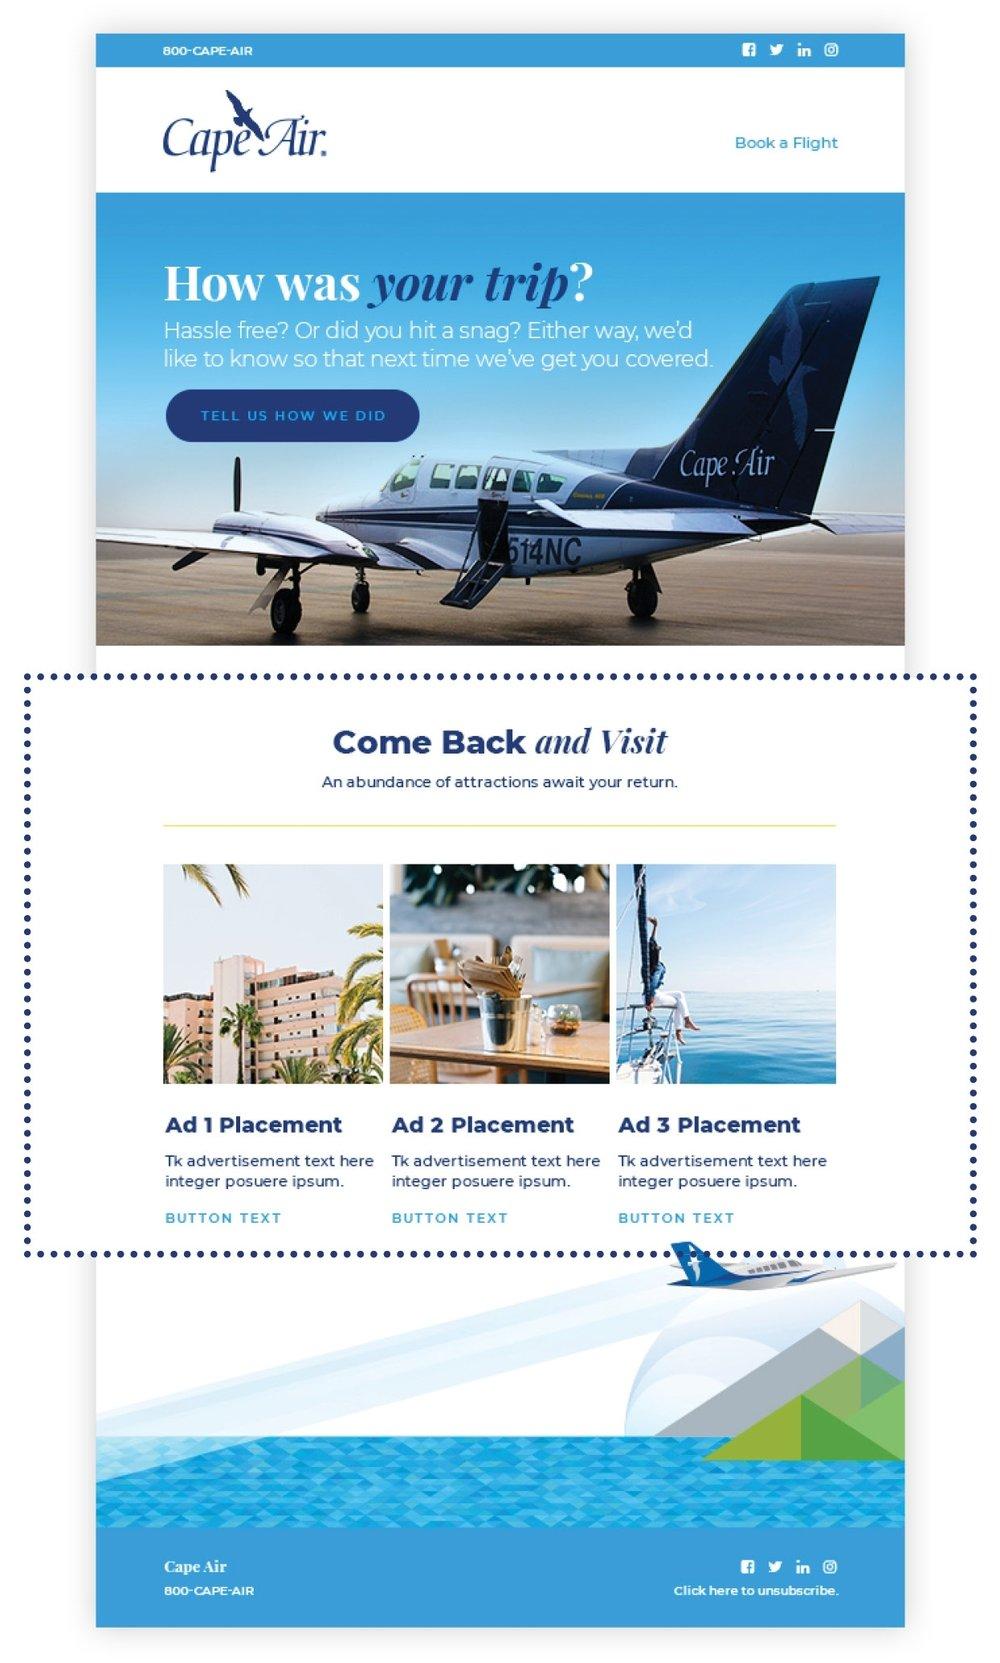 cape-air-ad-spec-postflight-preflight-email-graphic_02.jpg